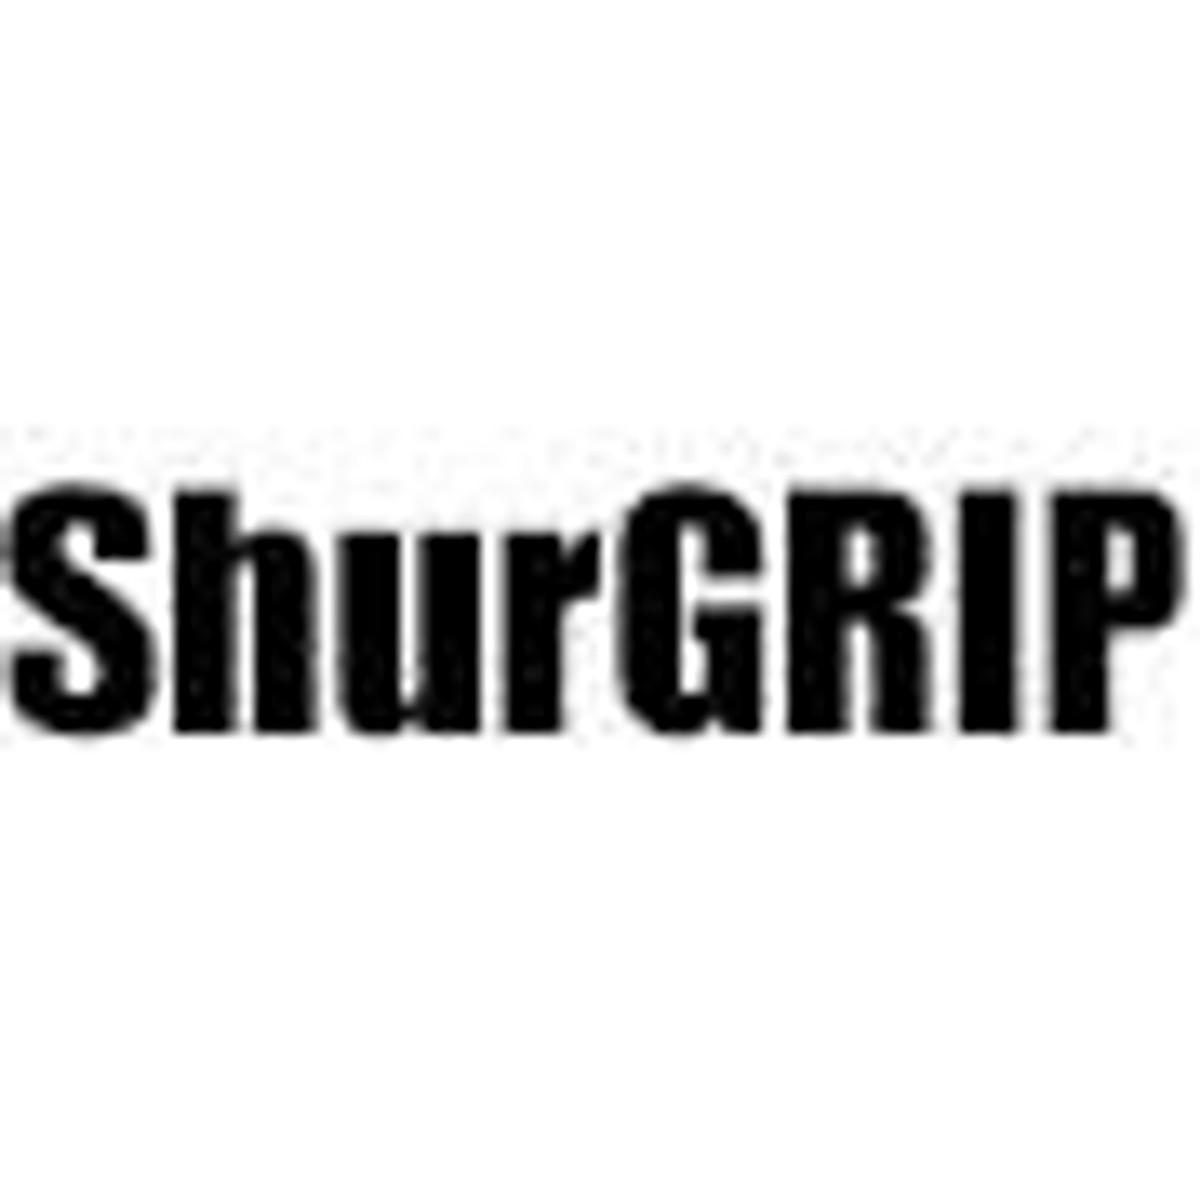 Shurgrip Tape